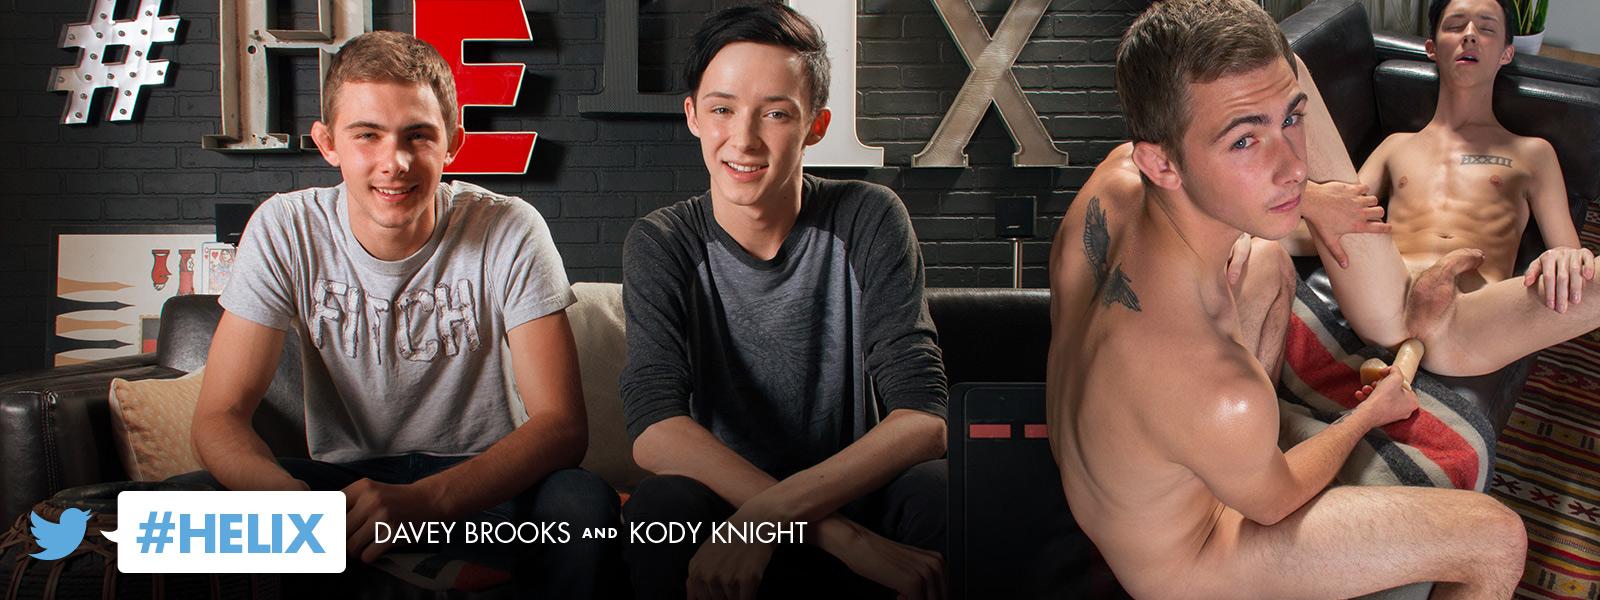 #helix: Davey Brooks and Kody Knight